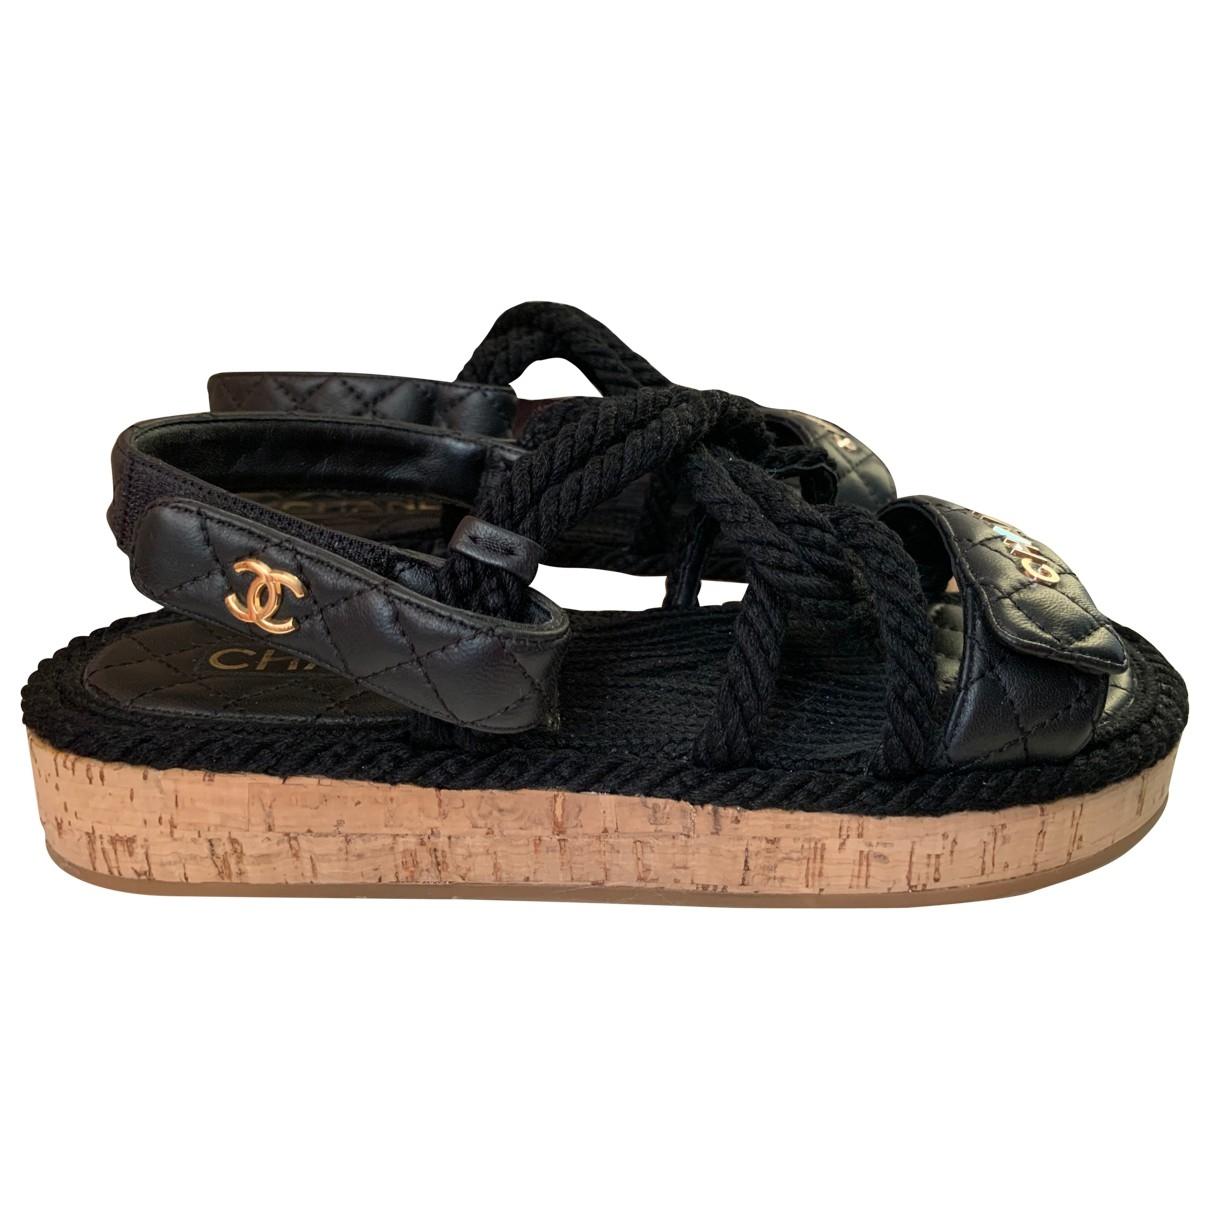 Chanel \N Black Leather Sandals for Women 38 EU